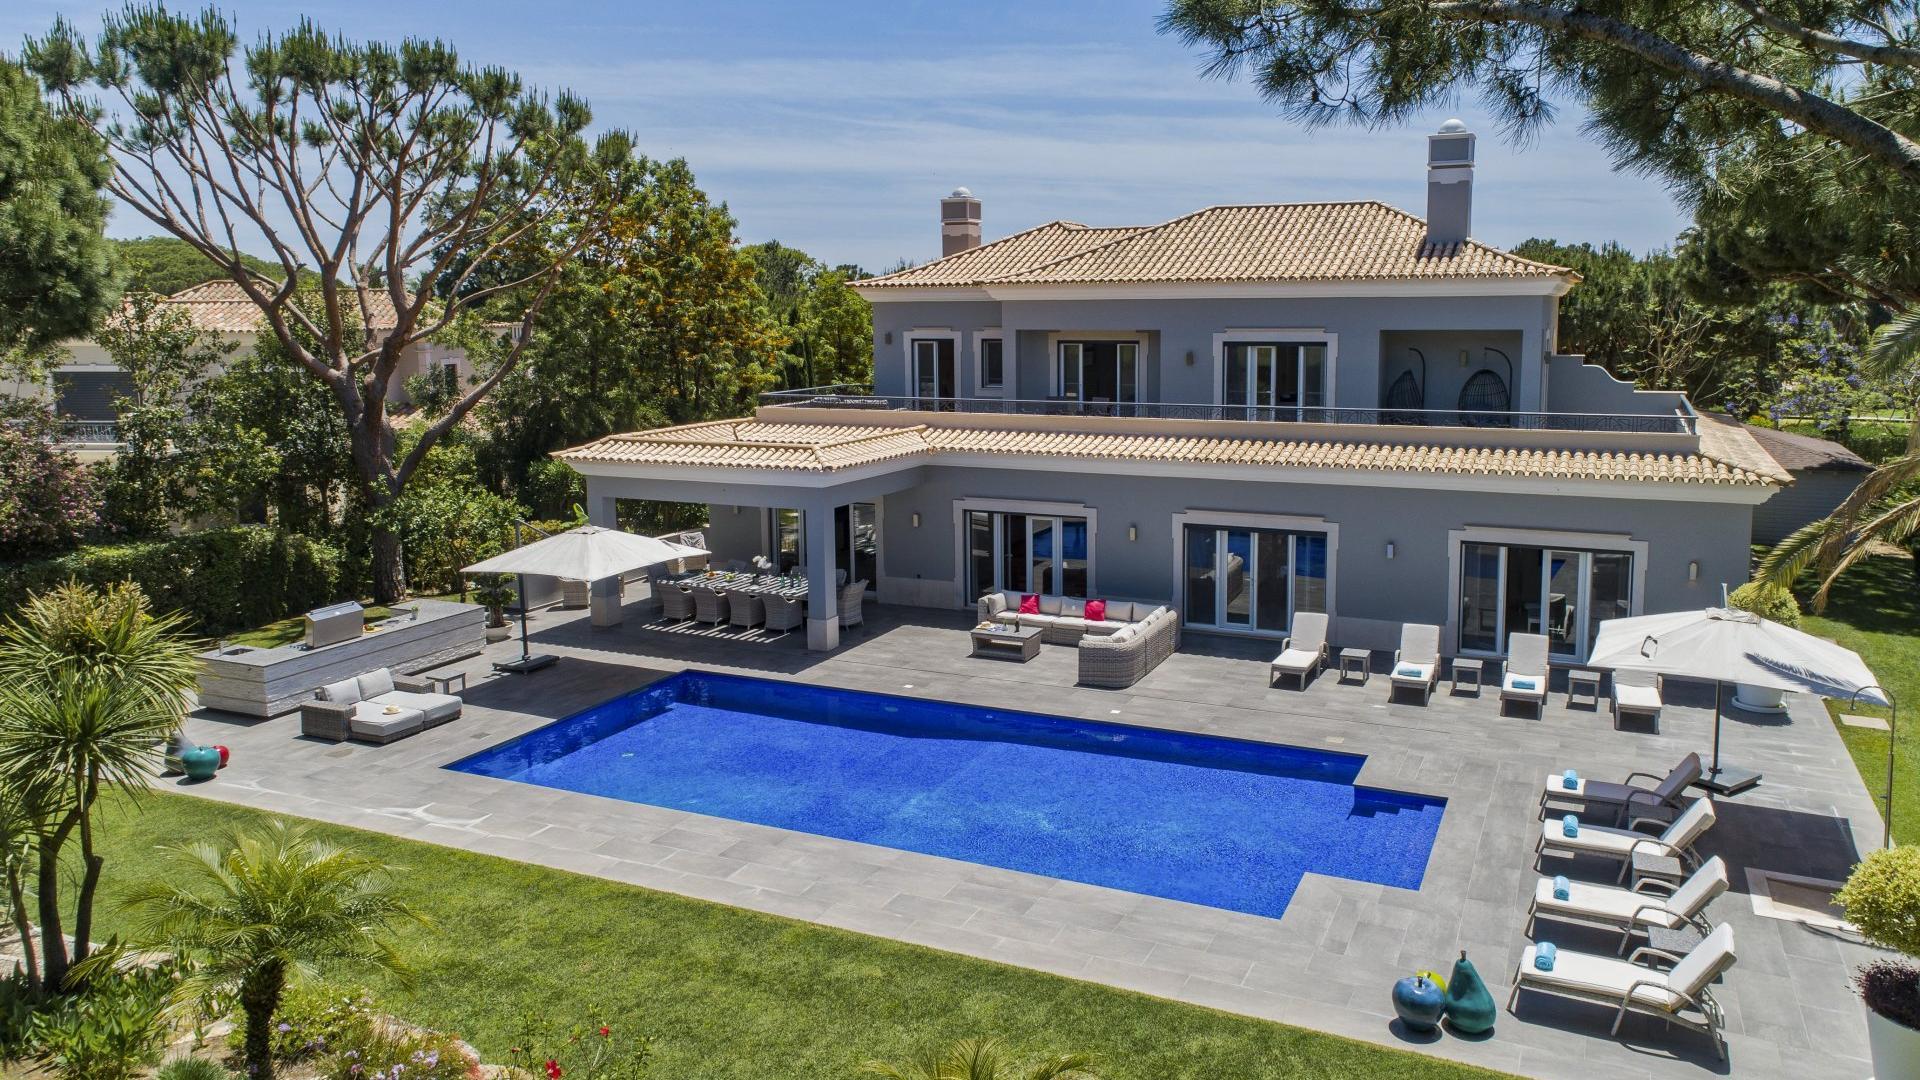 The Lodge - Quinta do Lago, Algarve - The_Lodge_Exterior_1_1.jpg